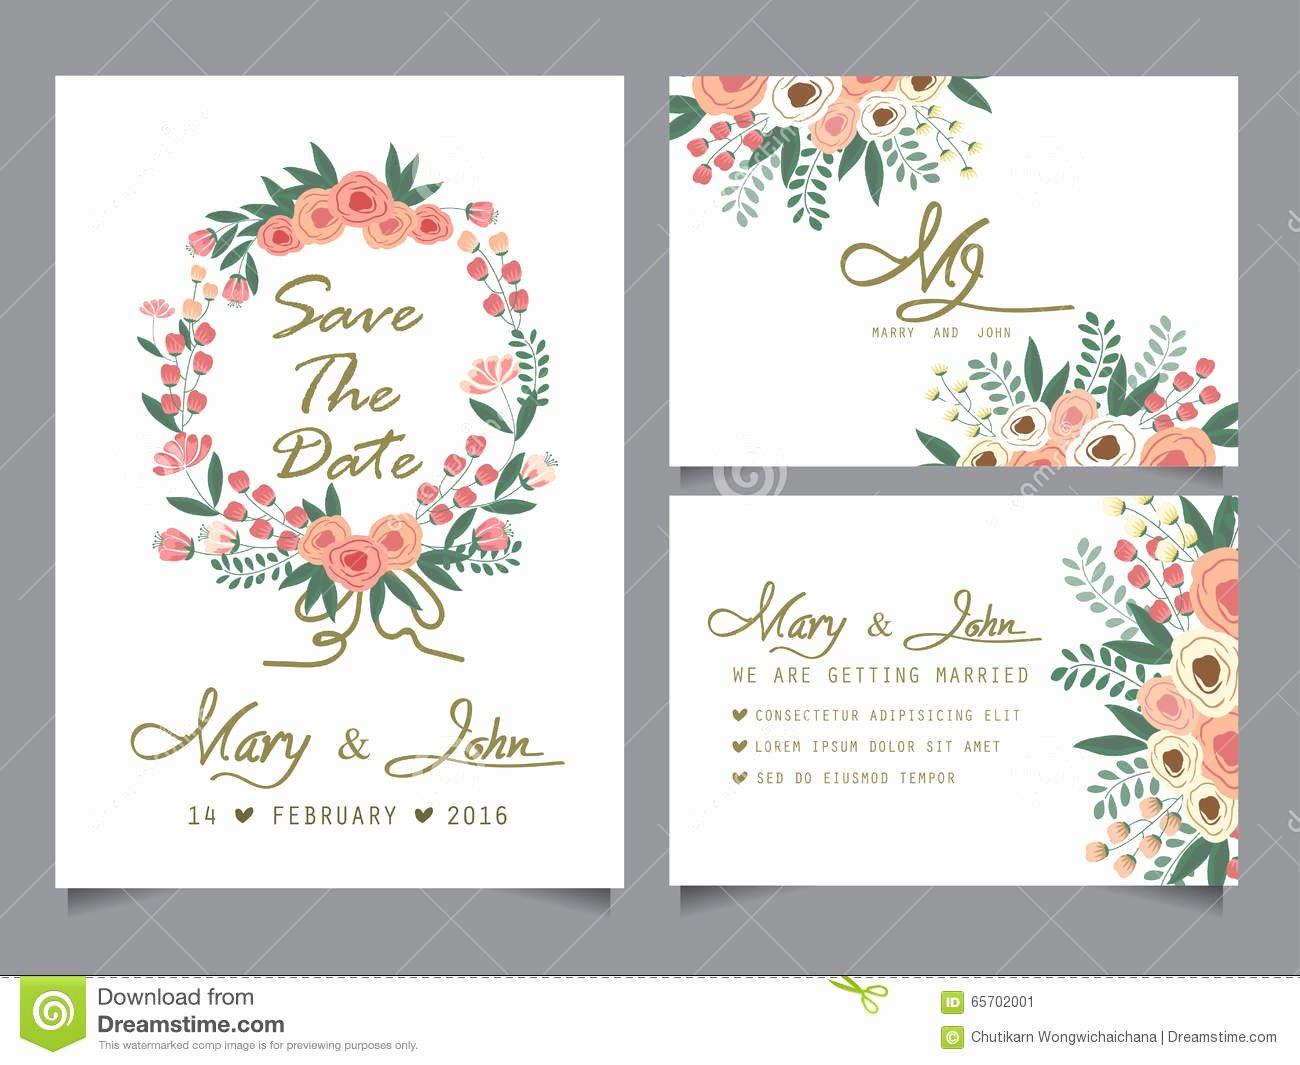 Postcard Wedding Invitations Template Inspirational Wedding Invitation Card Template Word